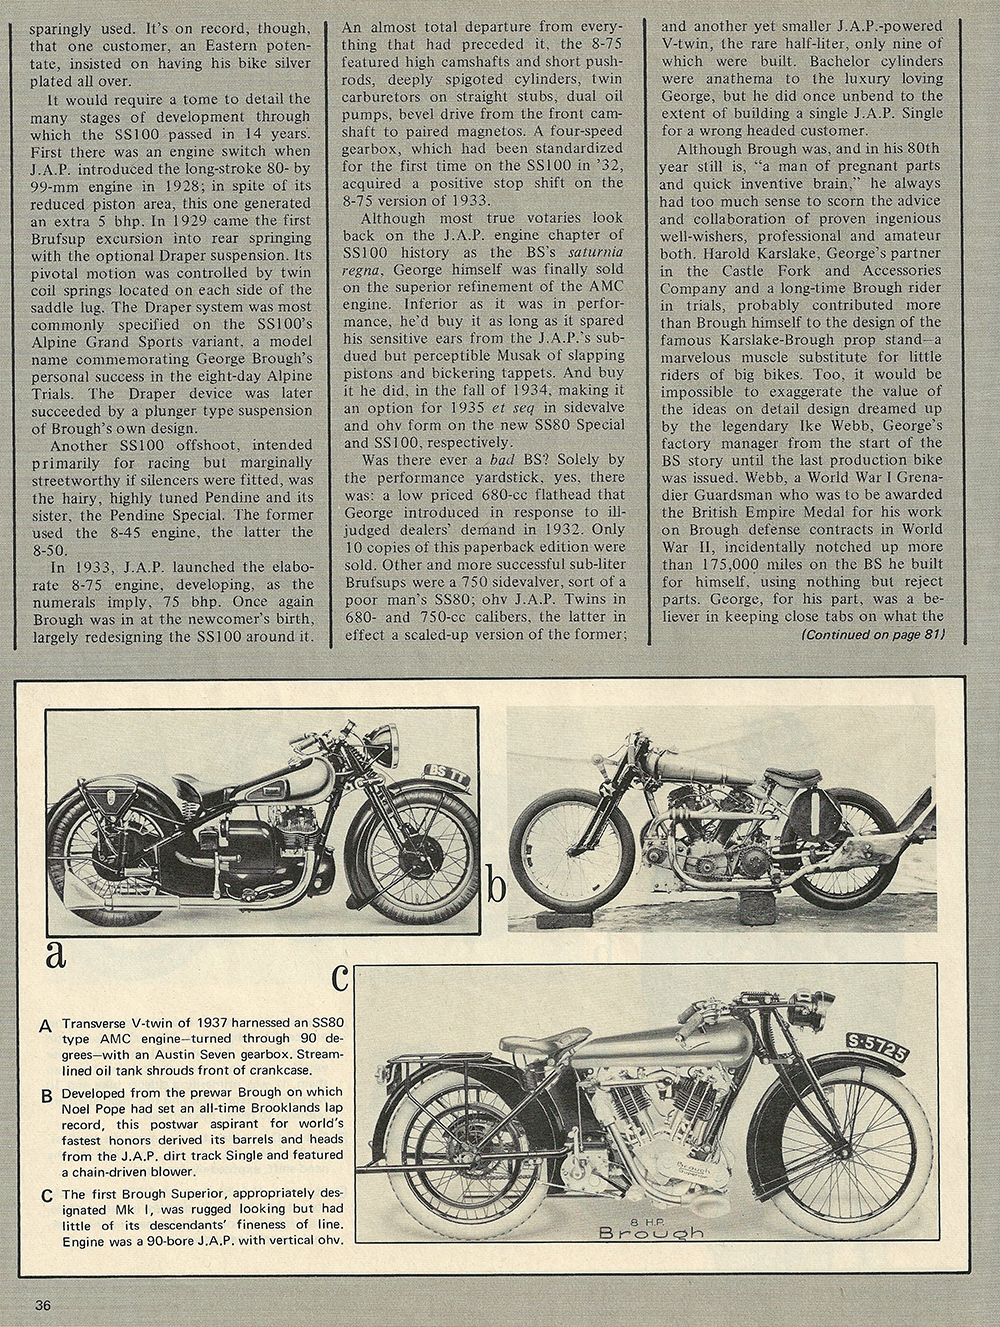 History of Brough Superior 04.jpg